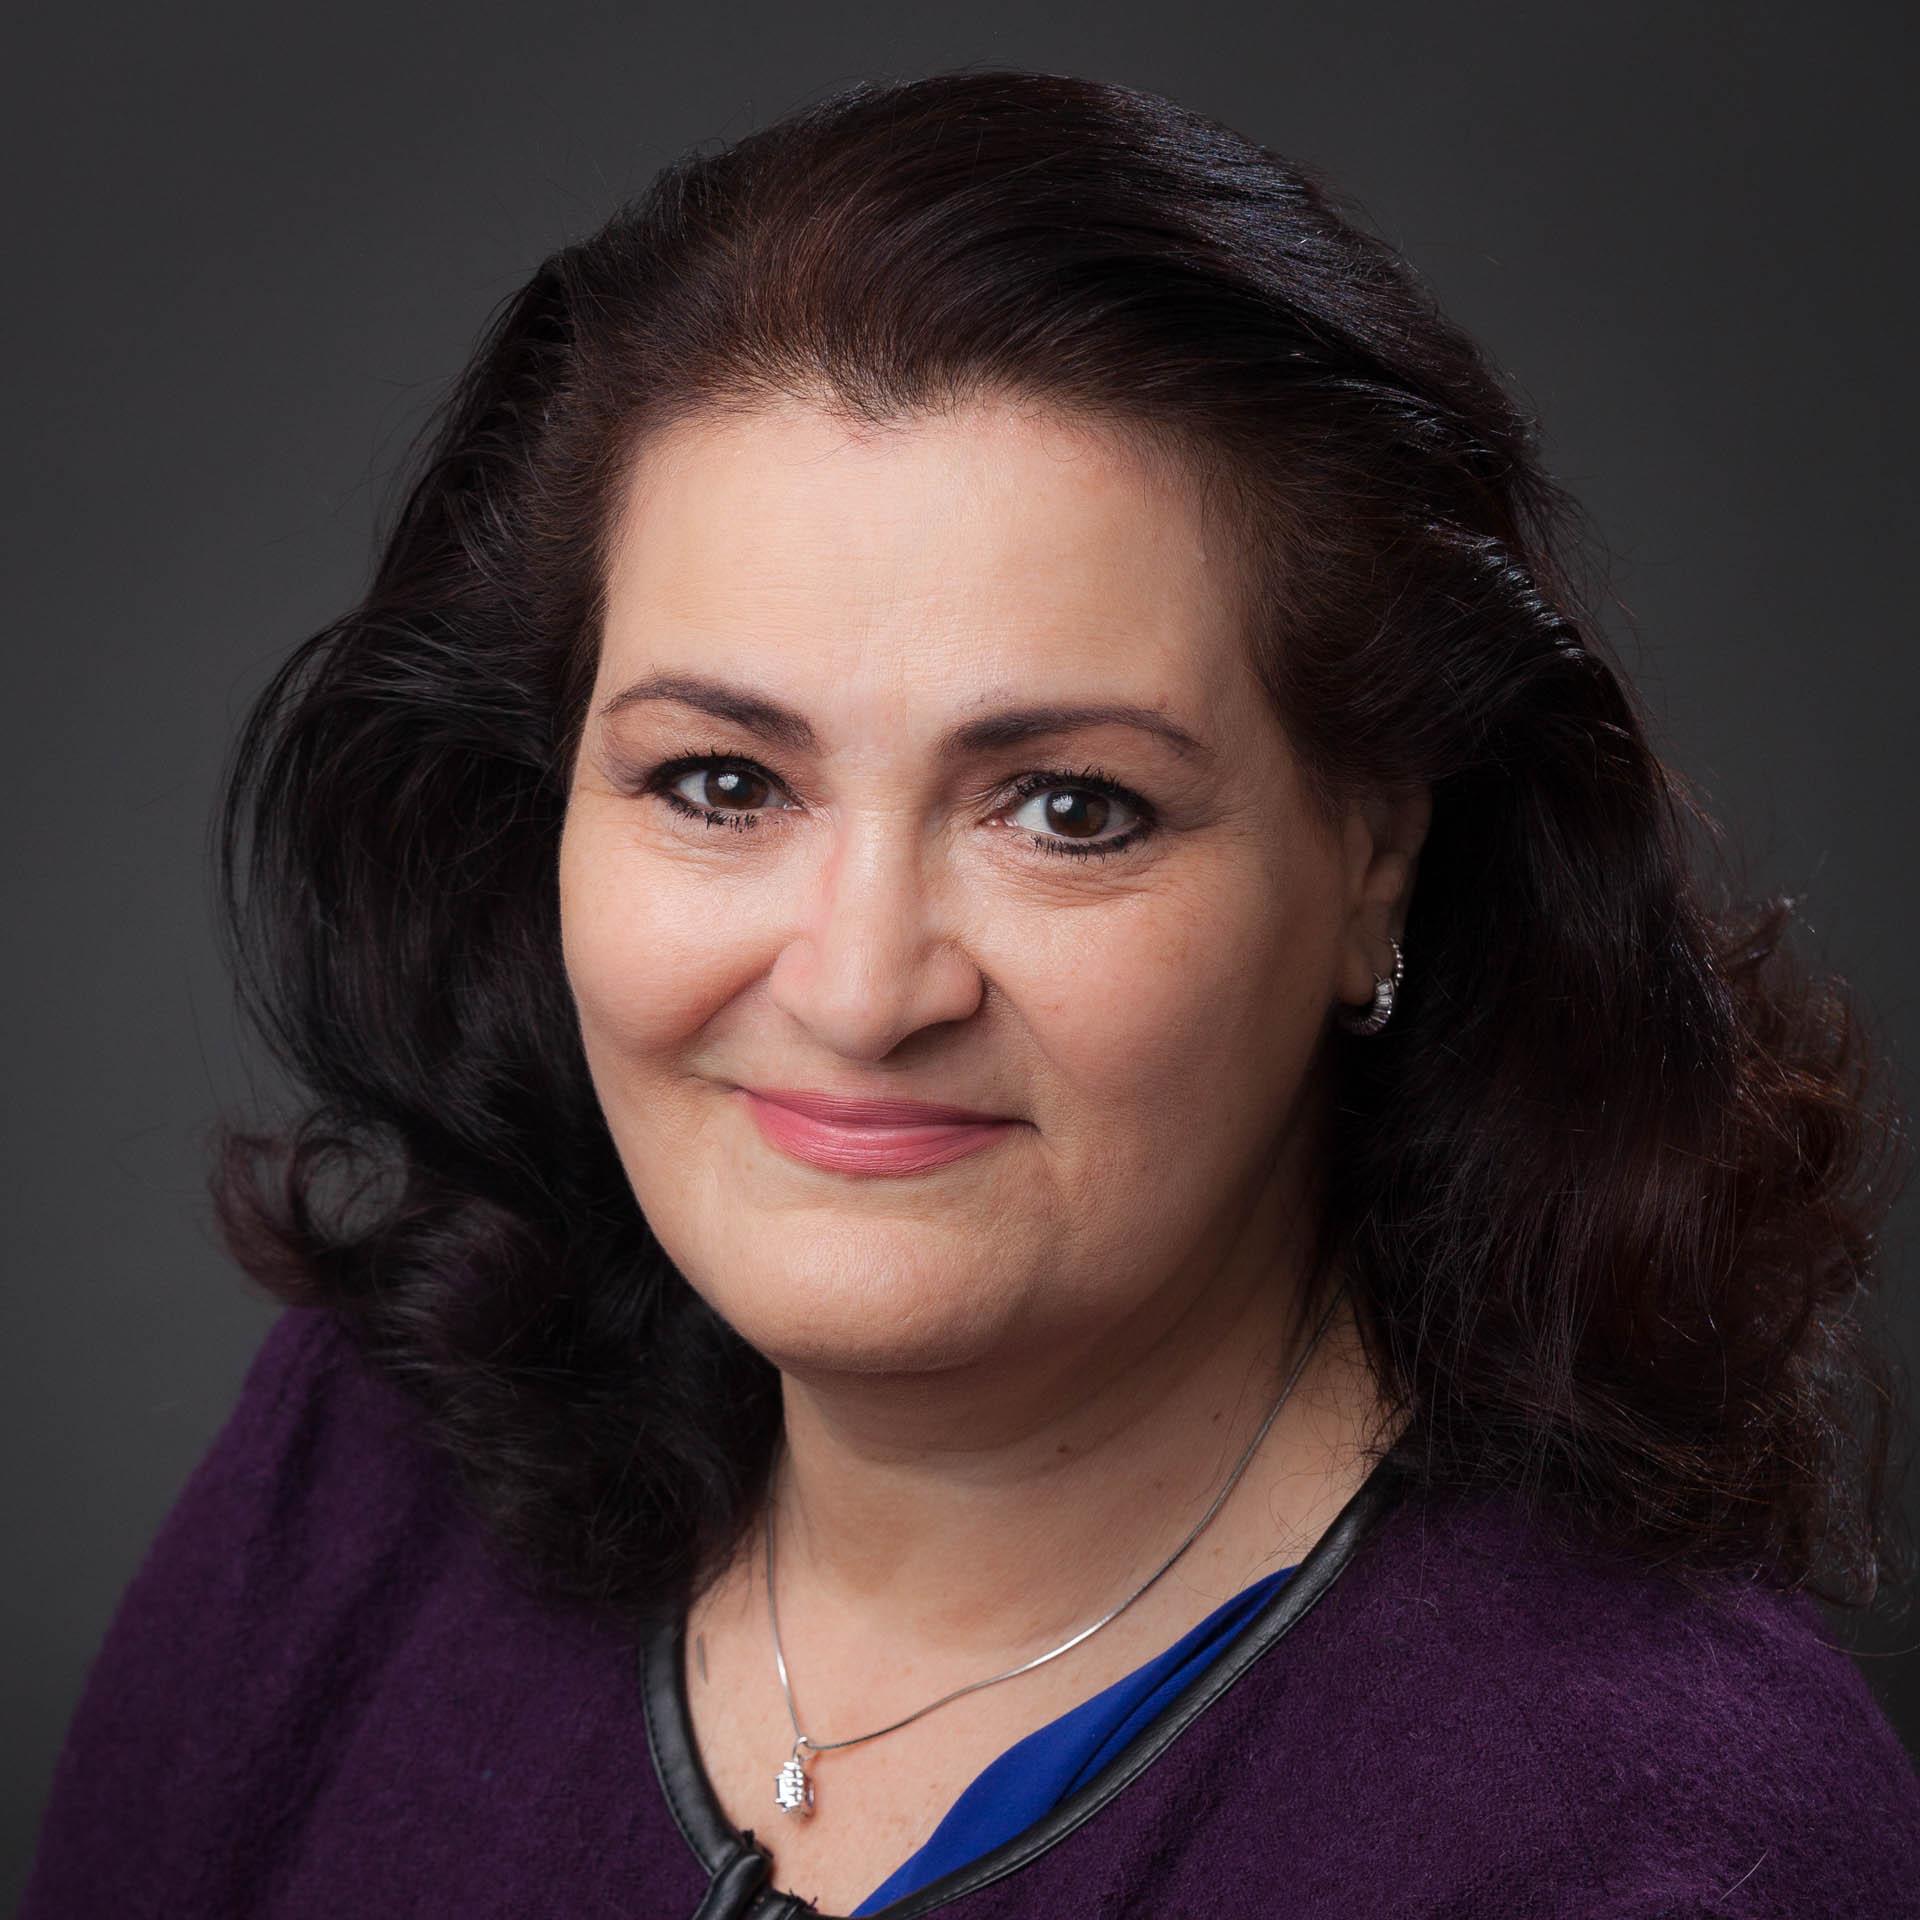 Victoria Pamias